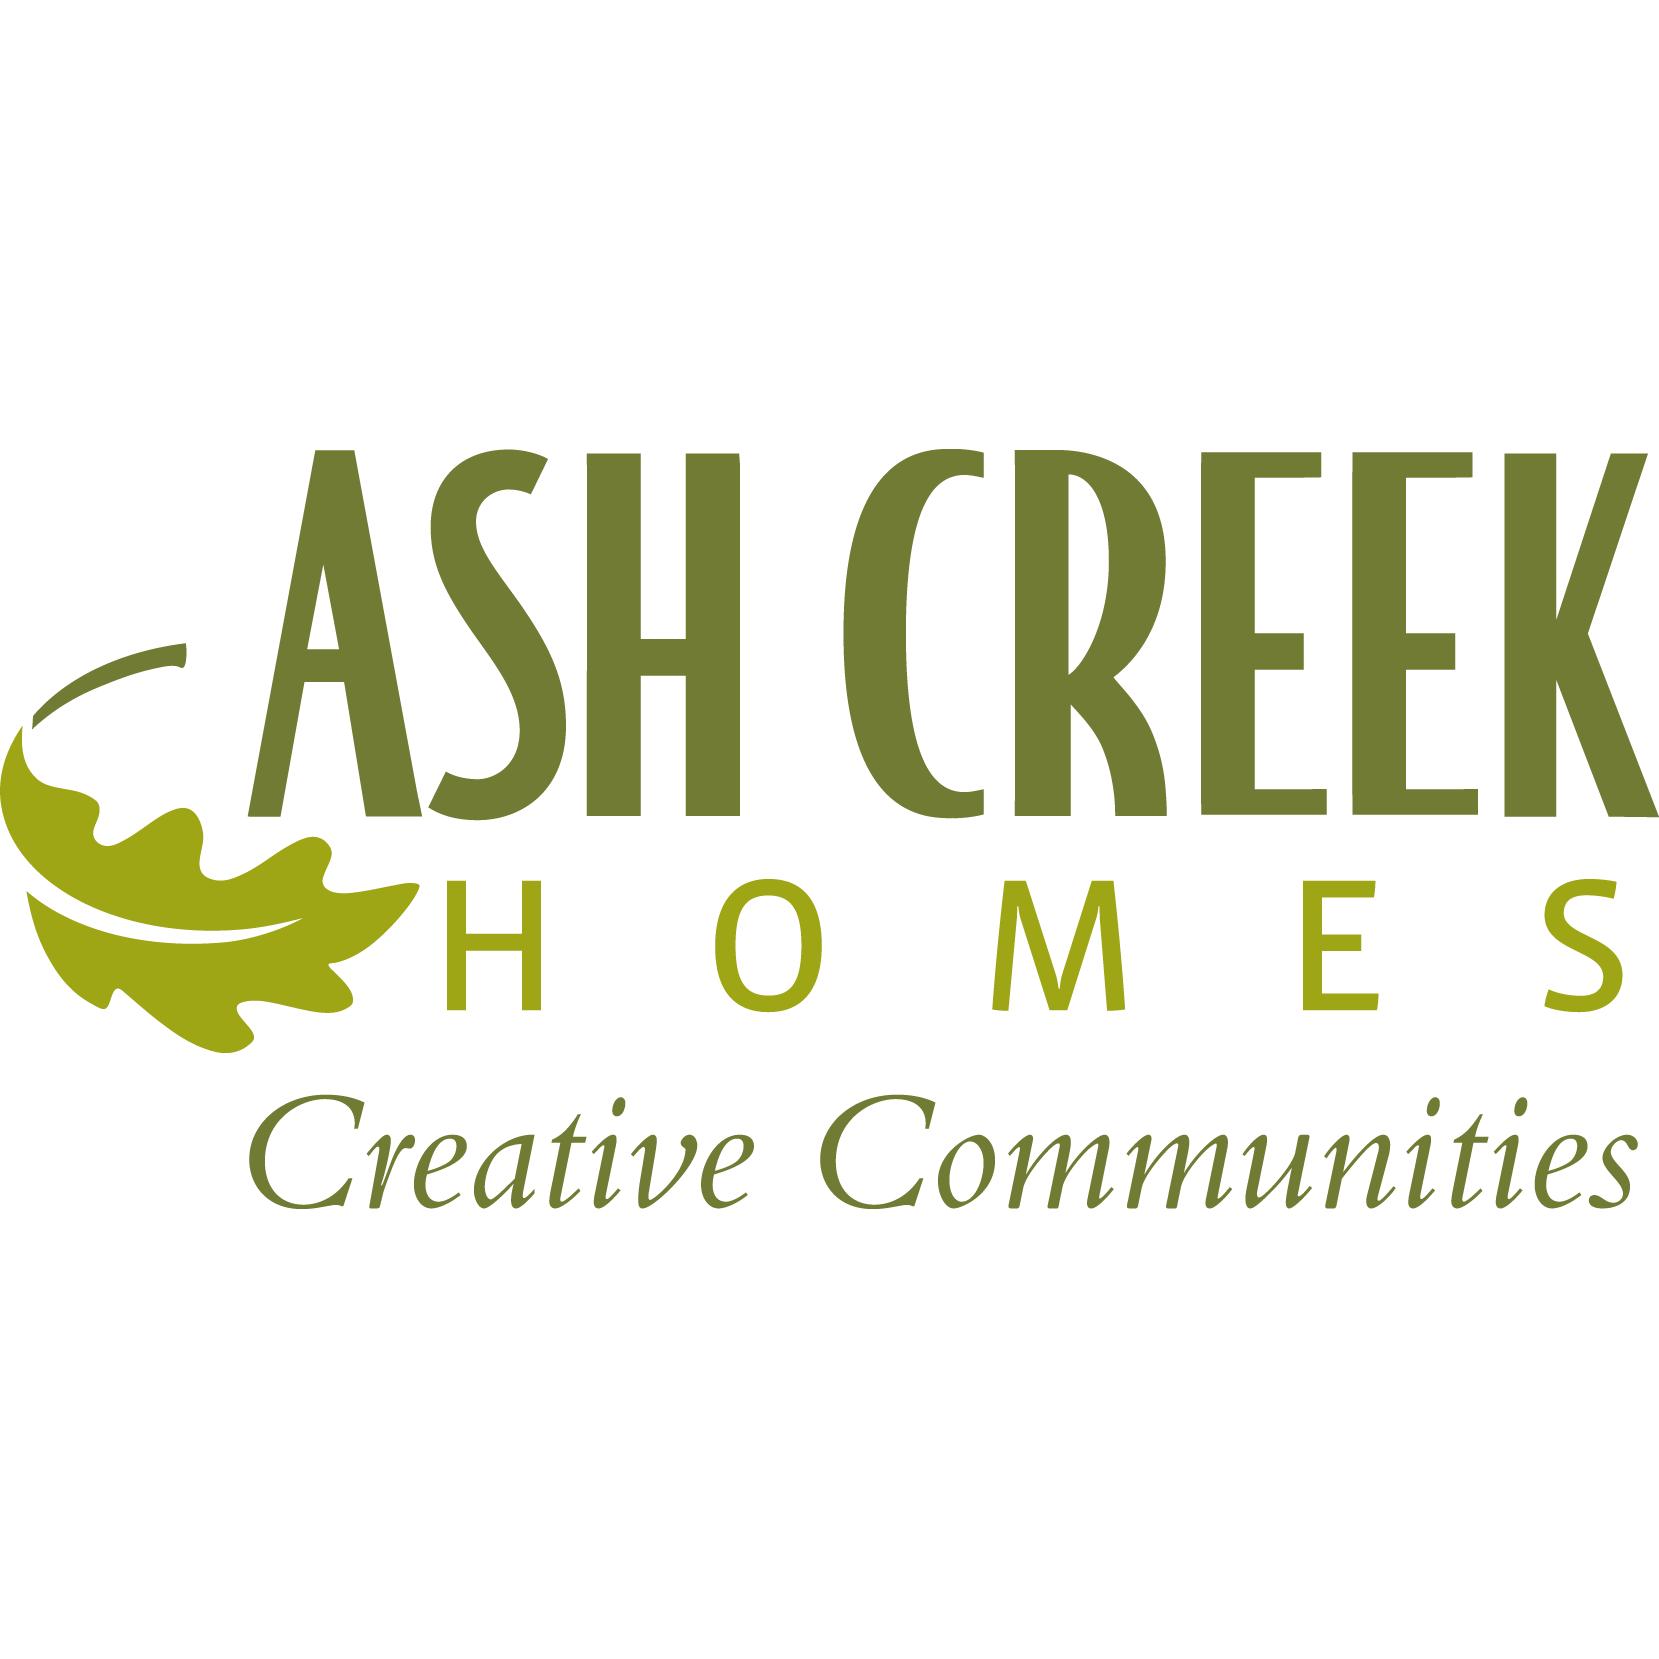 Ash Creek Homes - Lakeway, TX 78738 - (512)328-2122 | ShowMeLocal.com